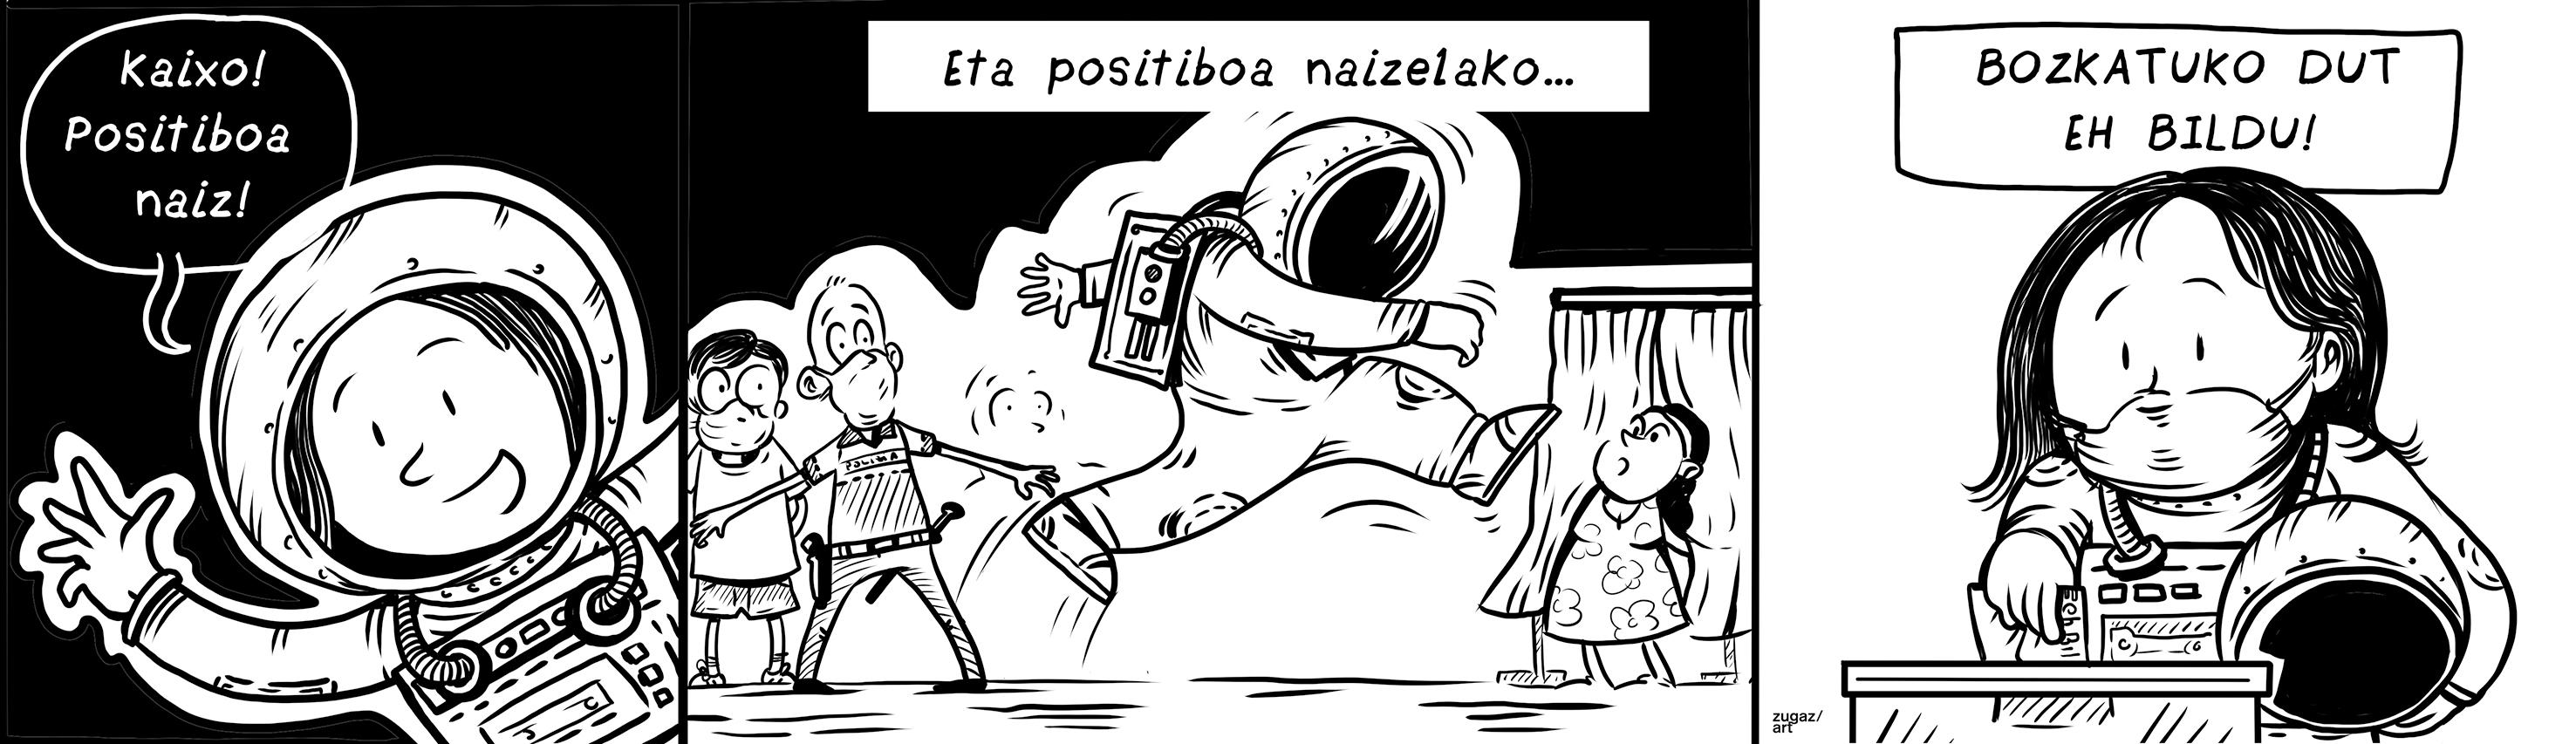 0712_zugazart